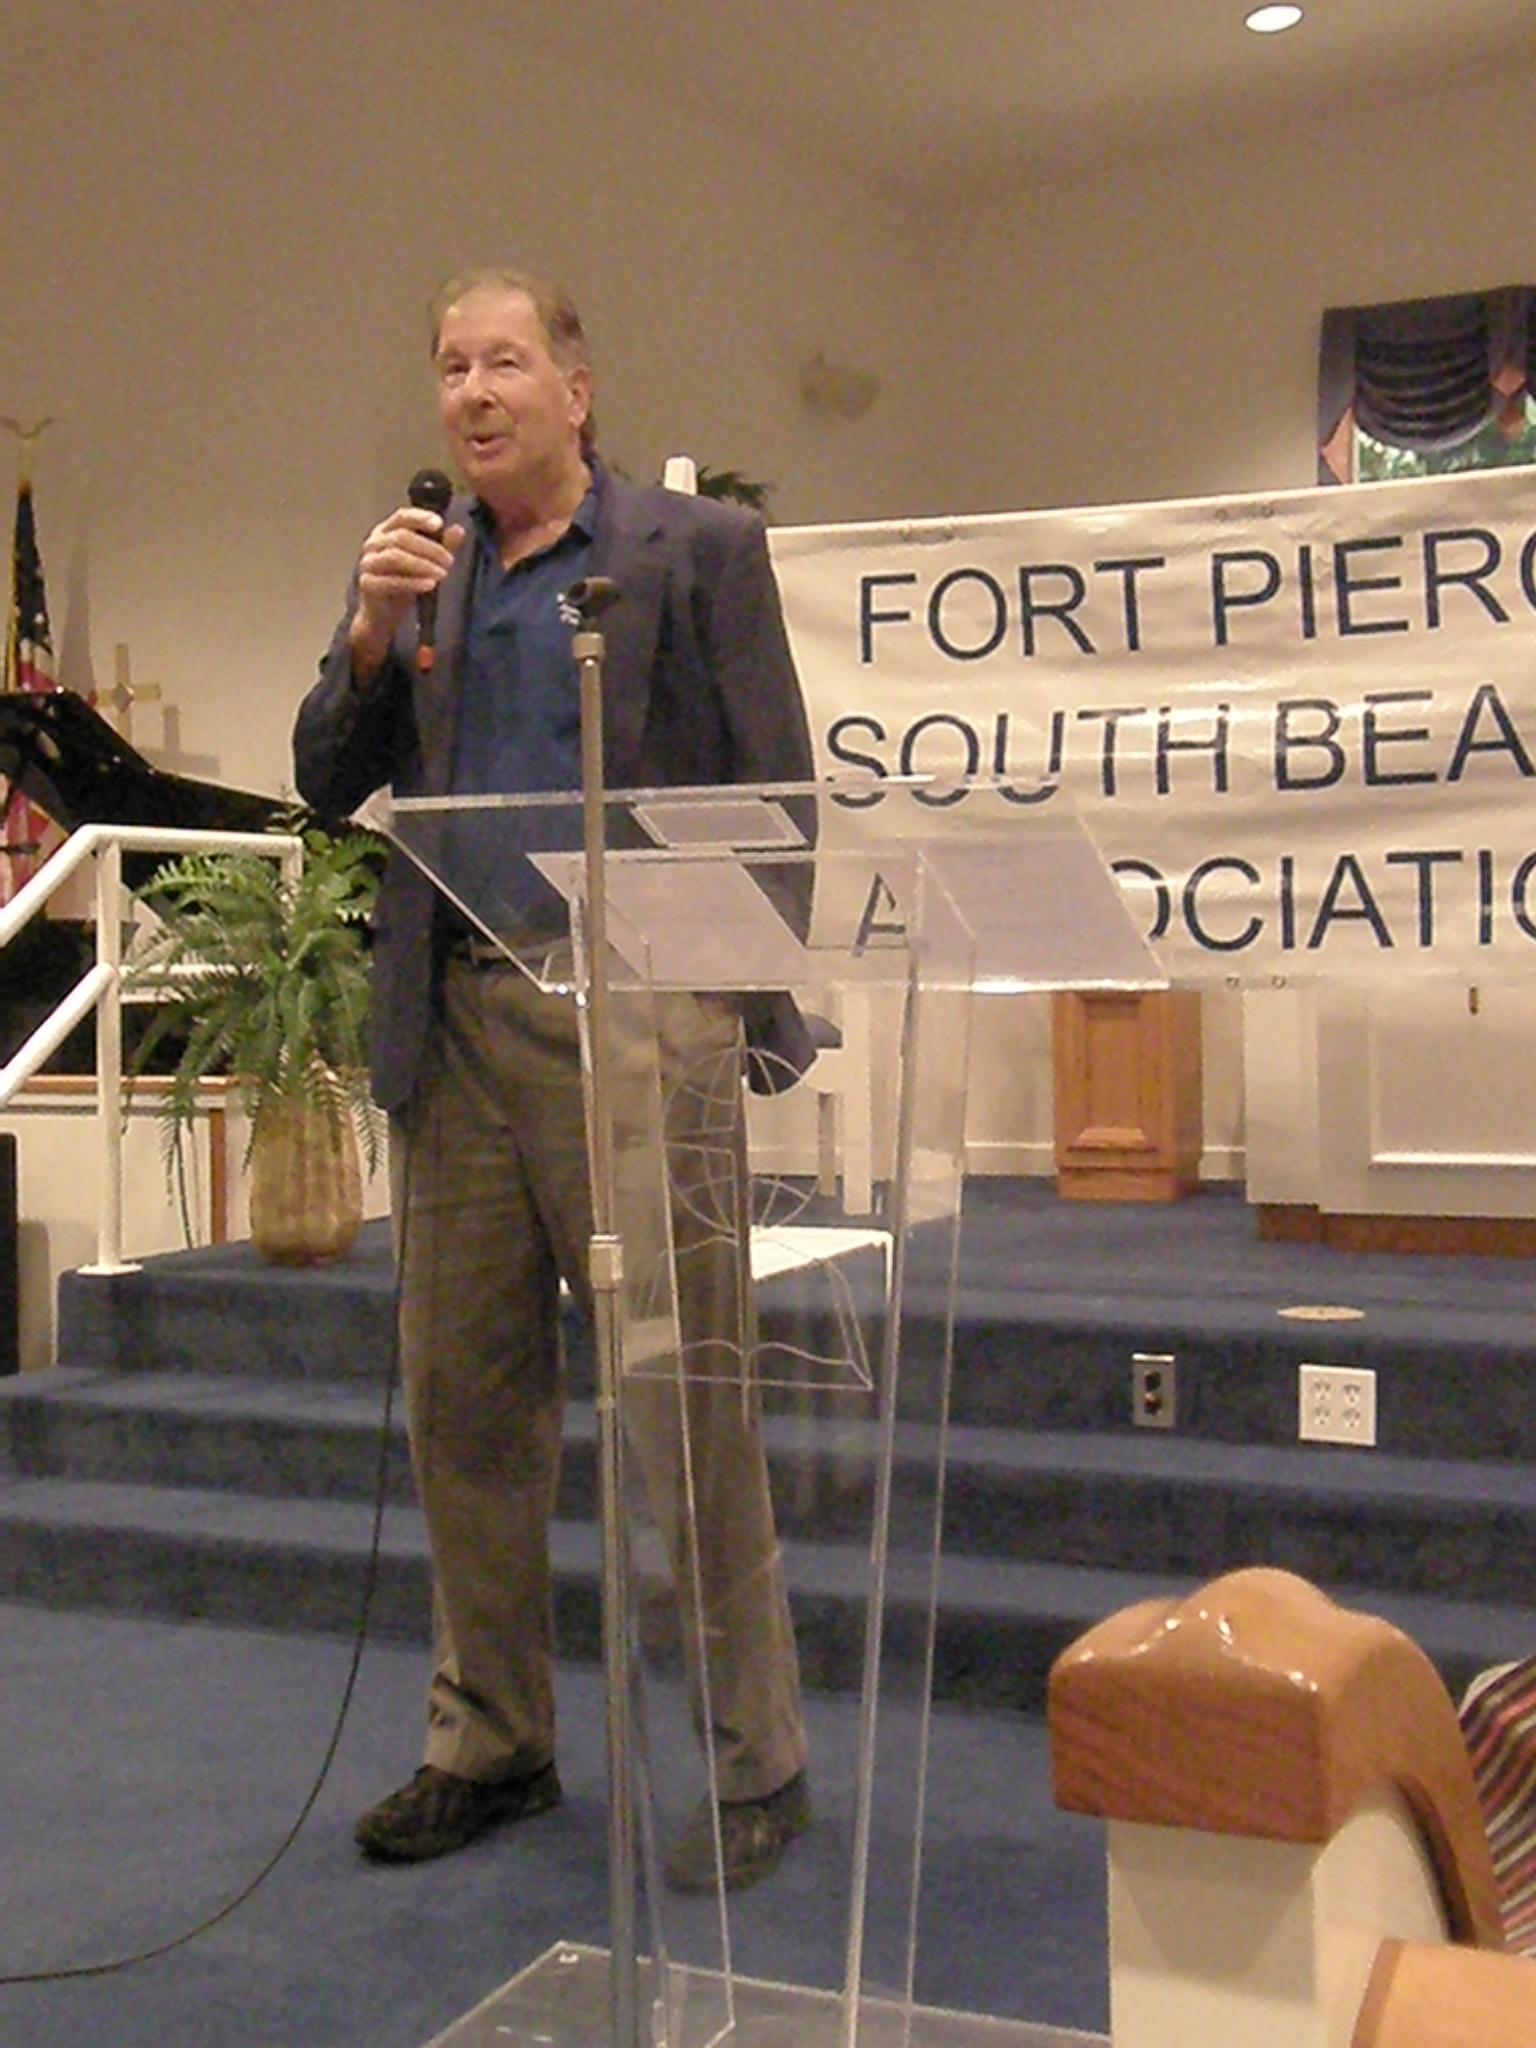 Paul Desborough gives the Treasurer's Report